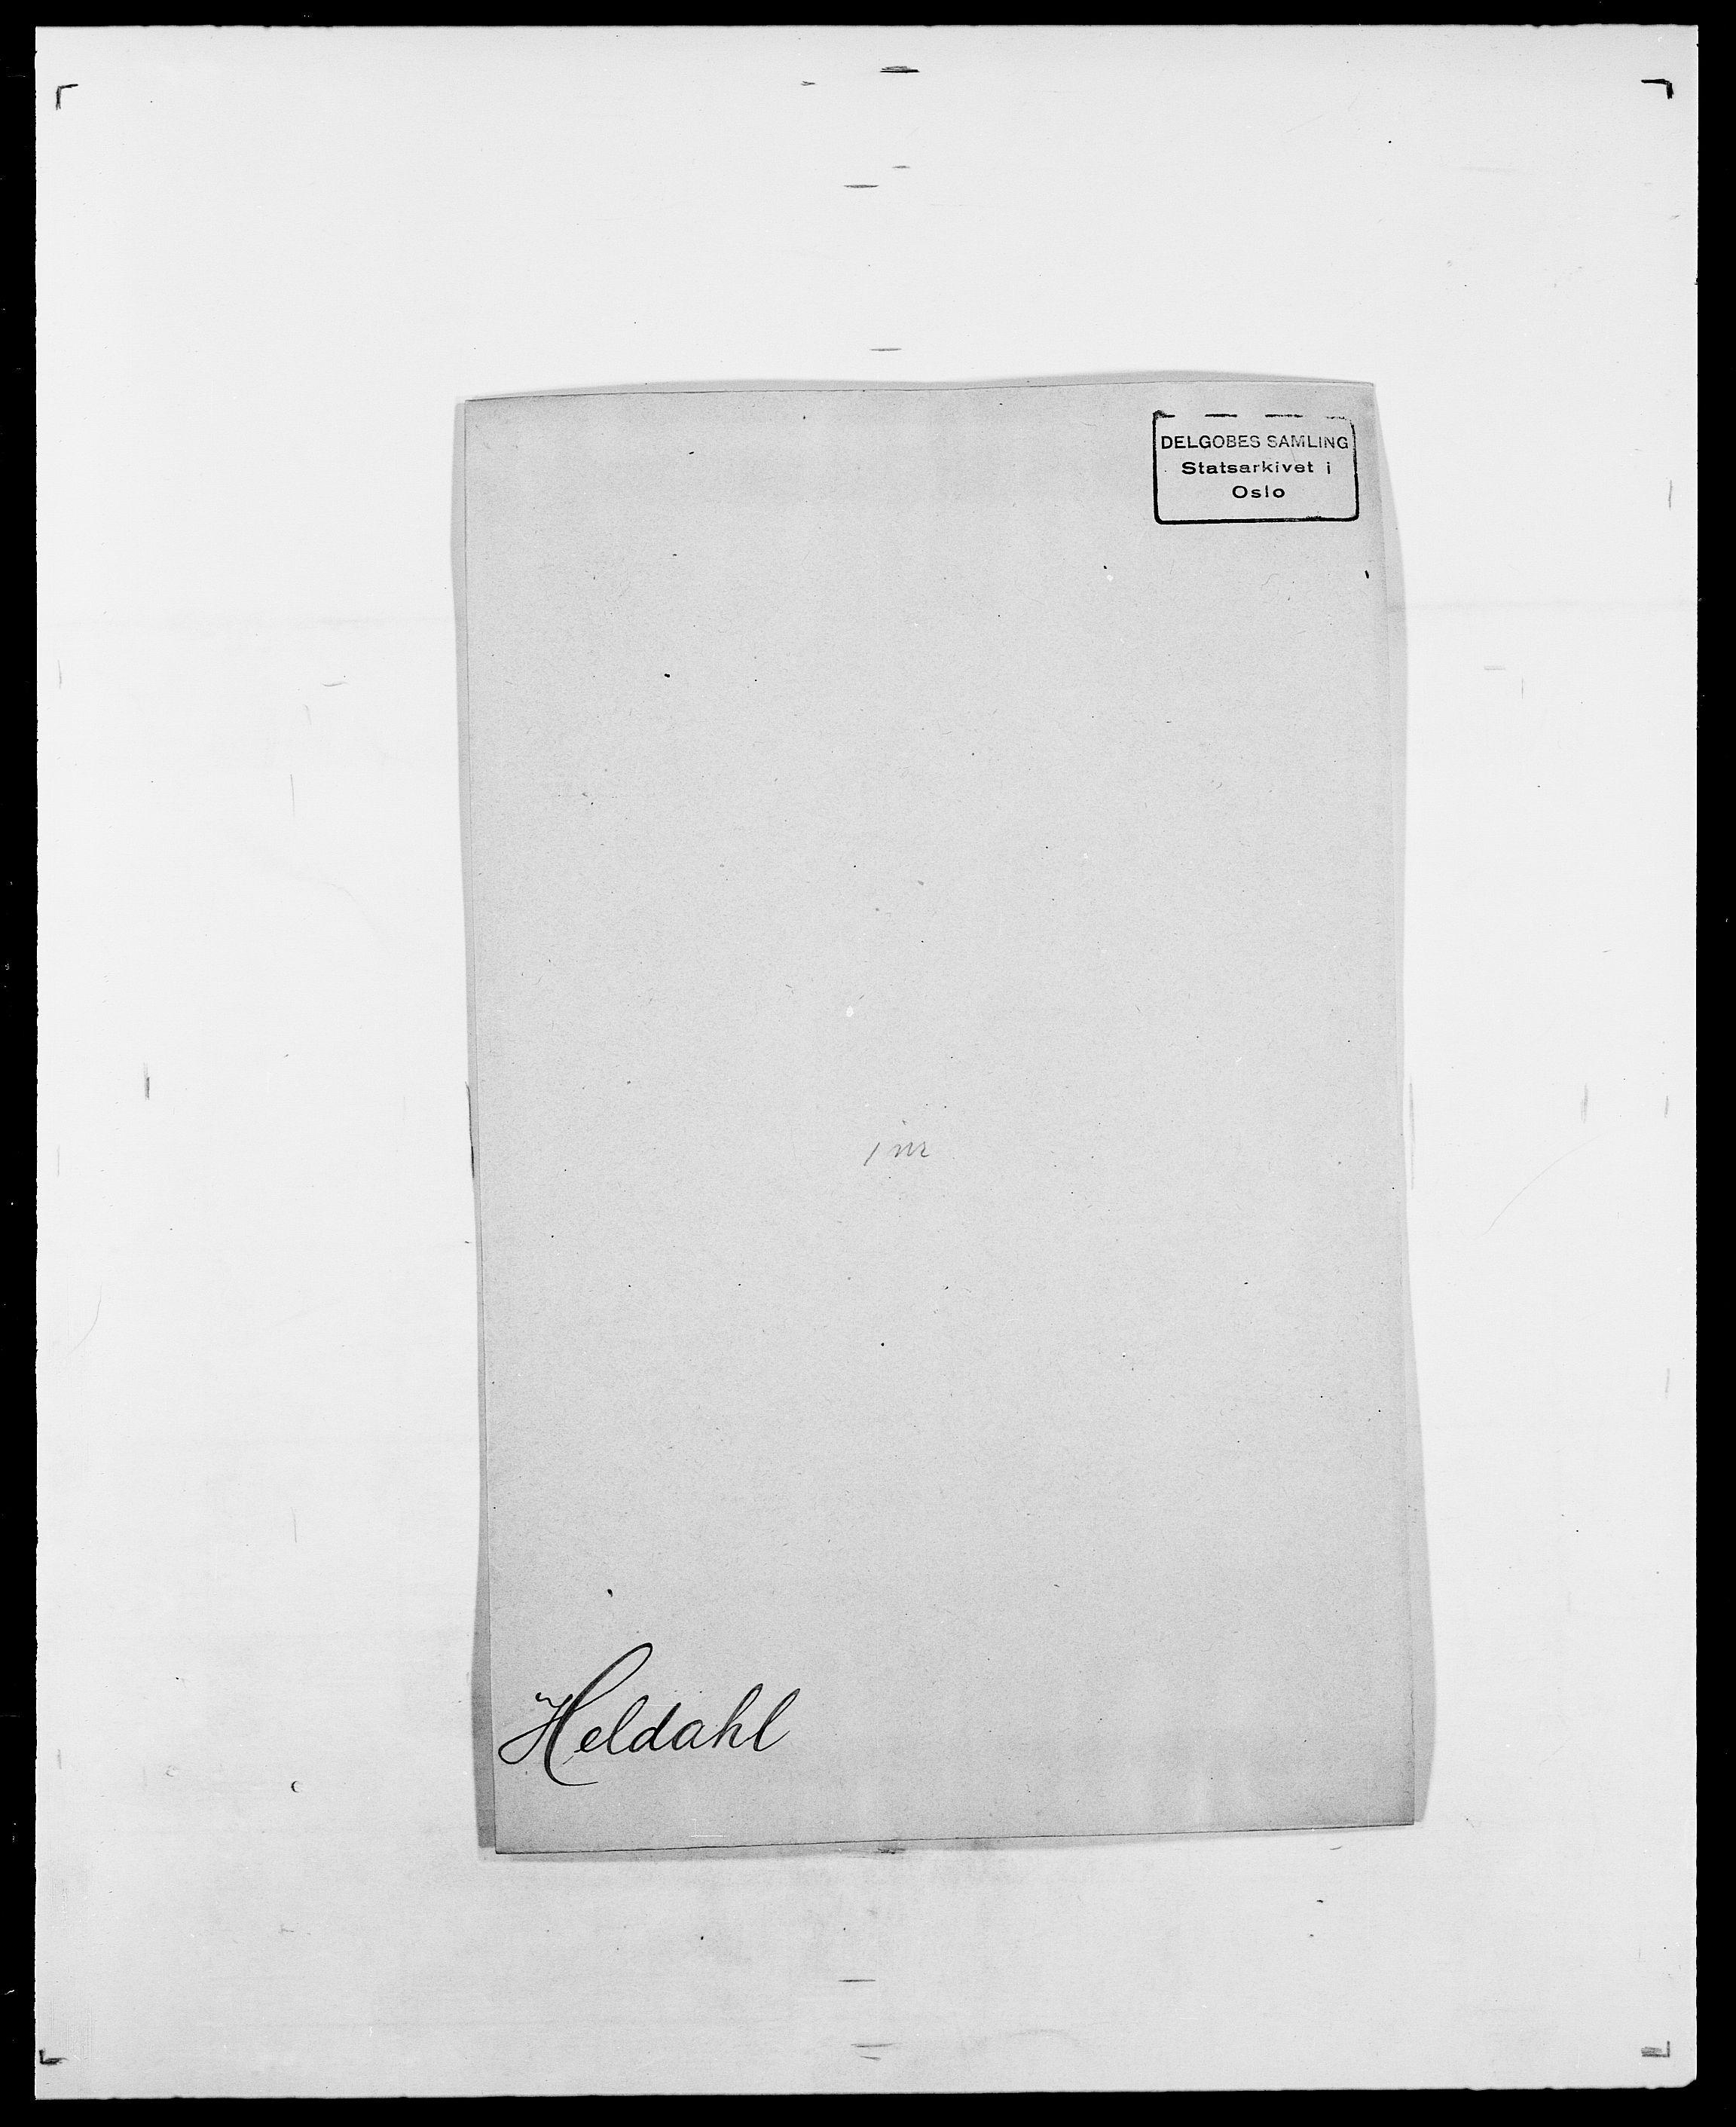 SAO, Delgobe, Charles Antoine - samling, D/Da/L0017: Helander - Hjørne, s. 5